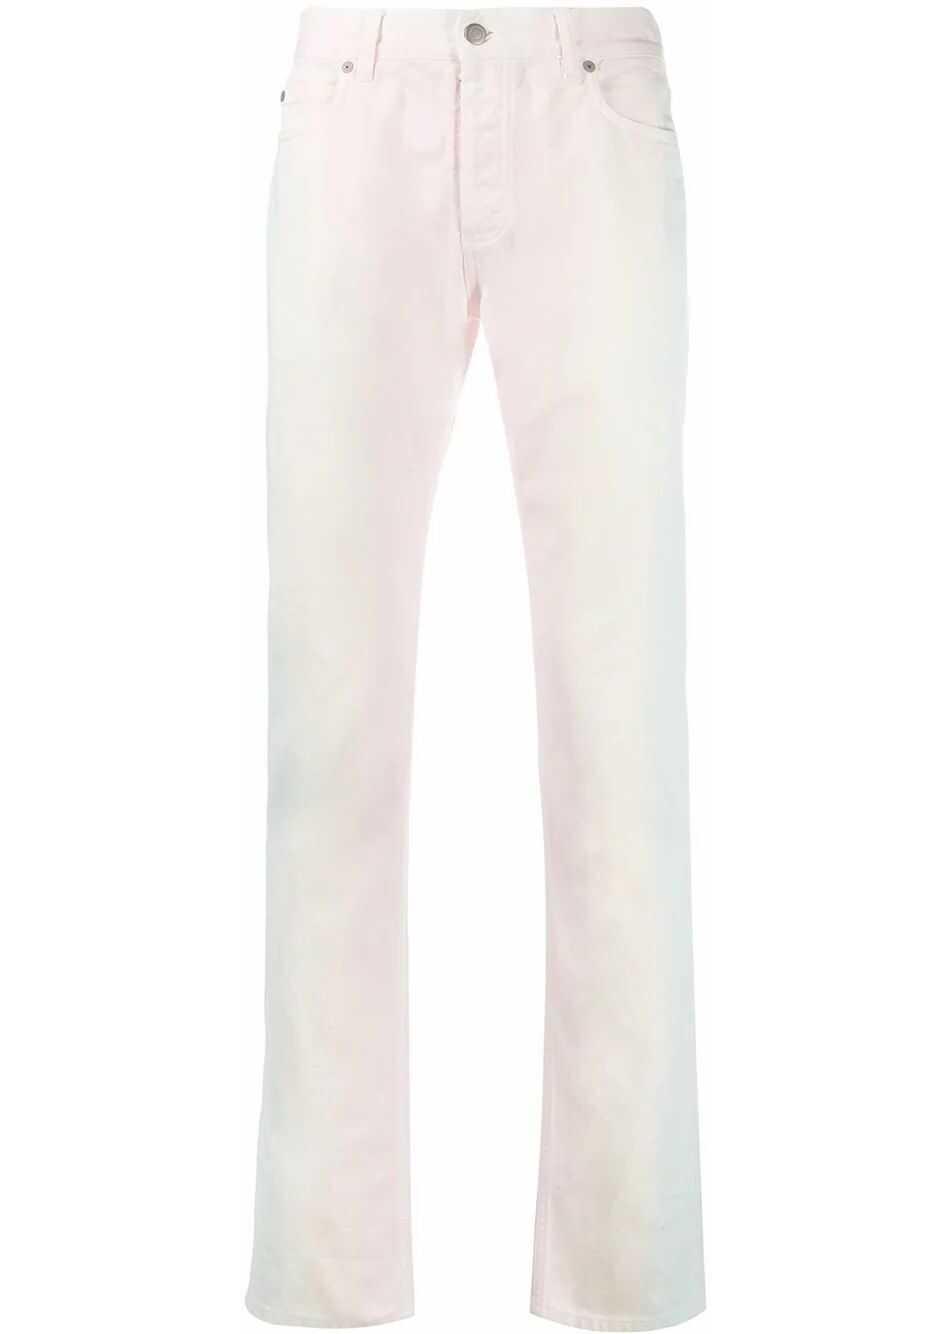 Maison Margiela Cotton Jeans WHITE